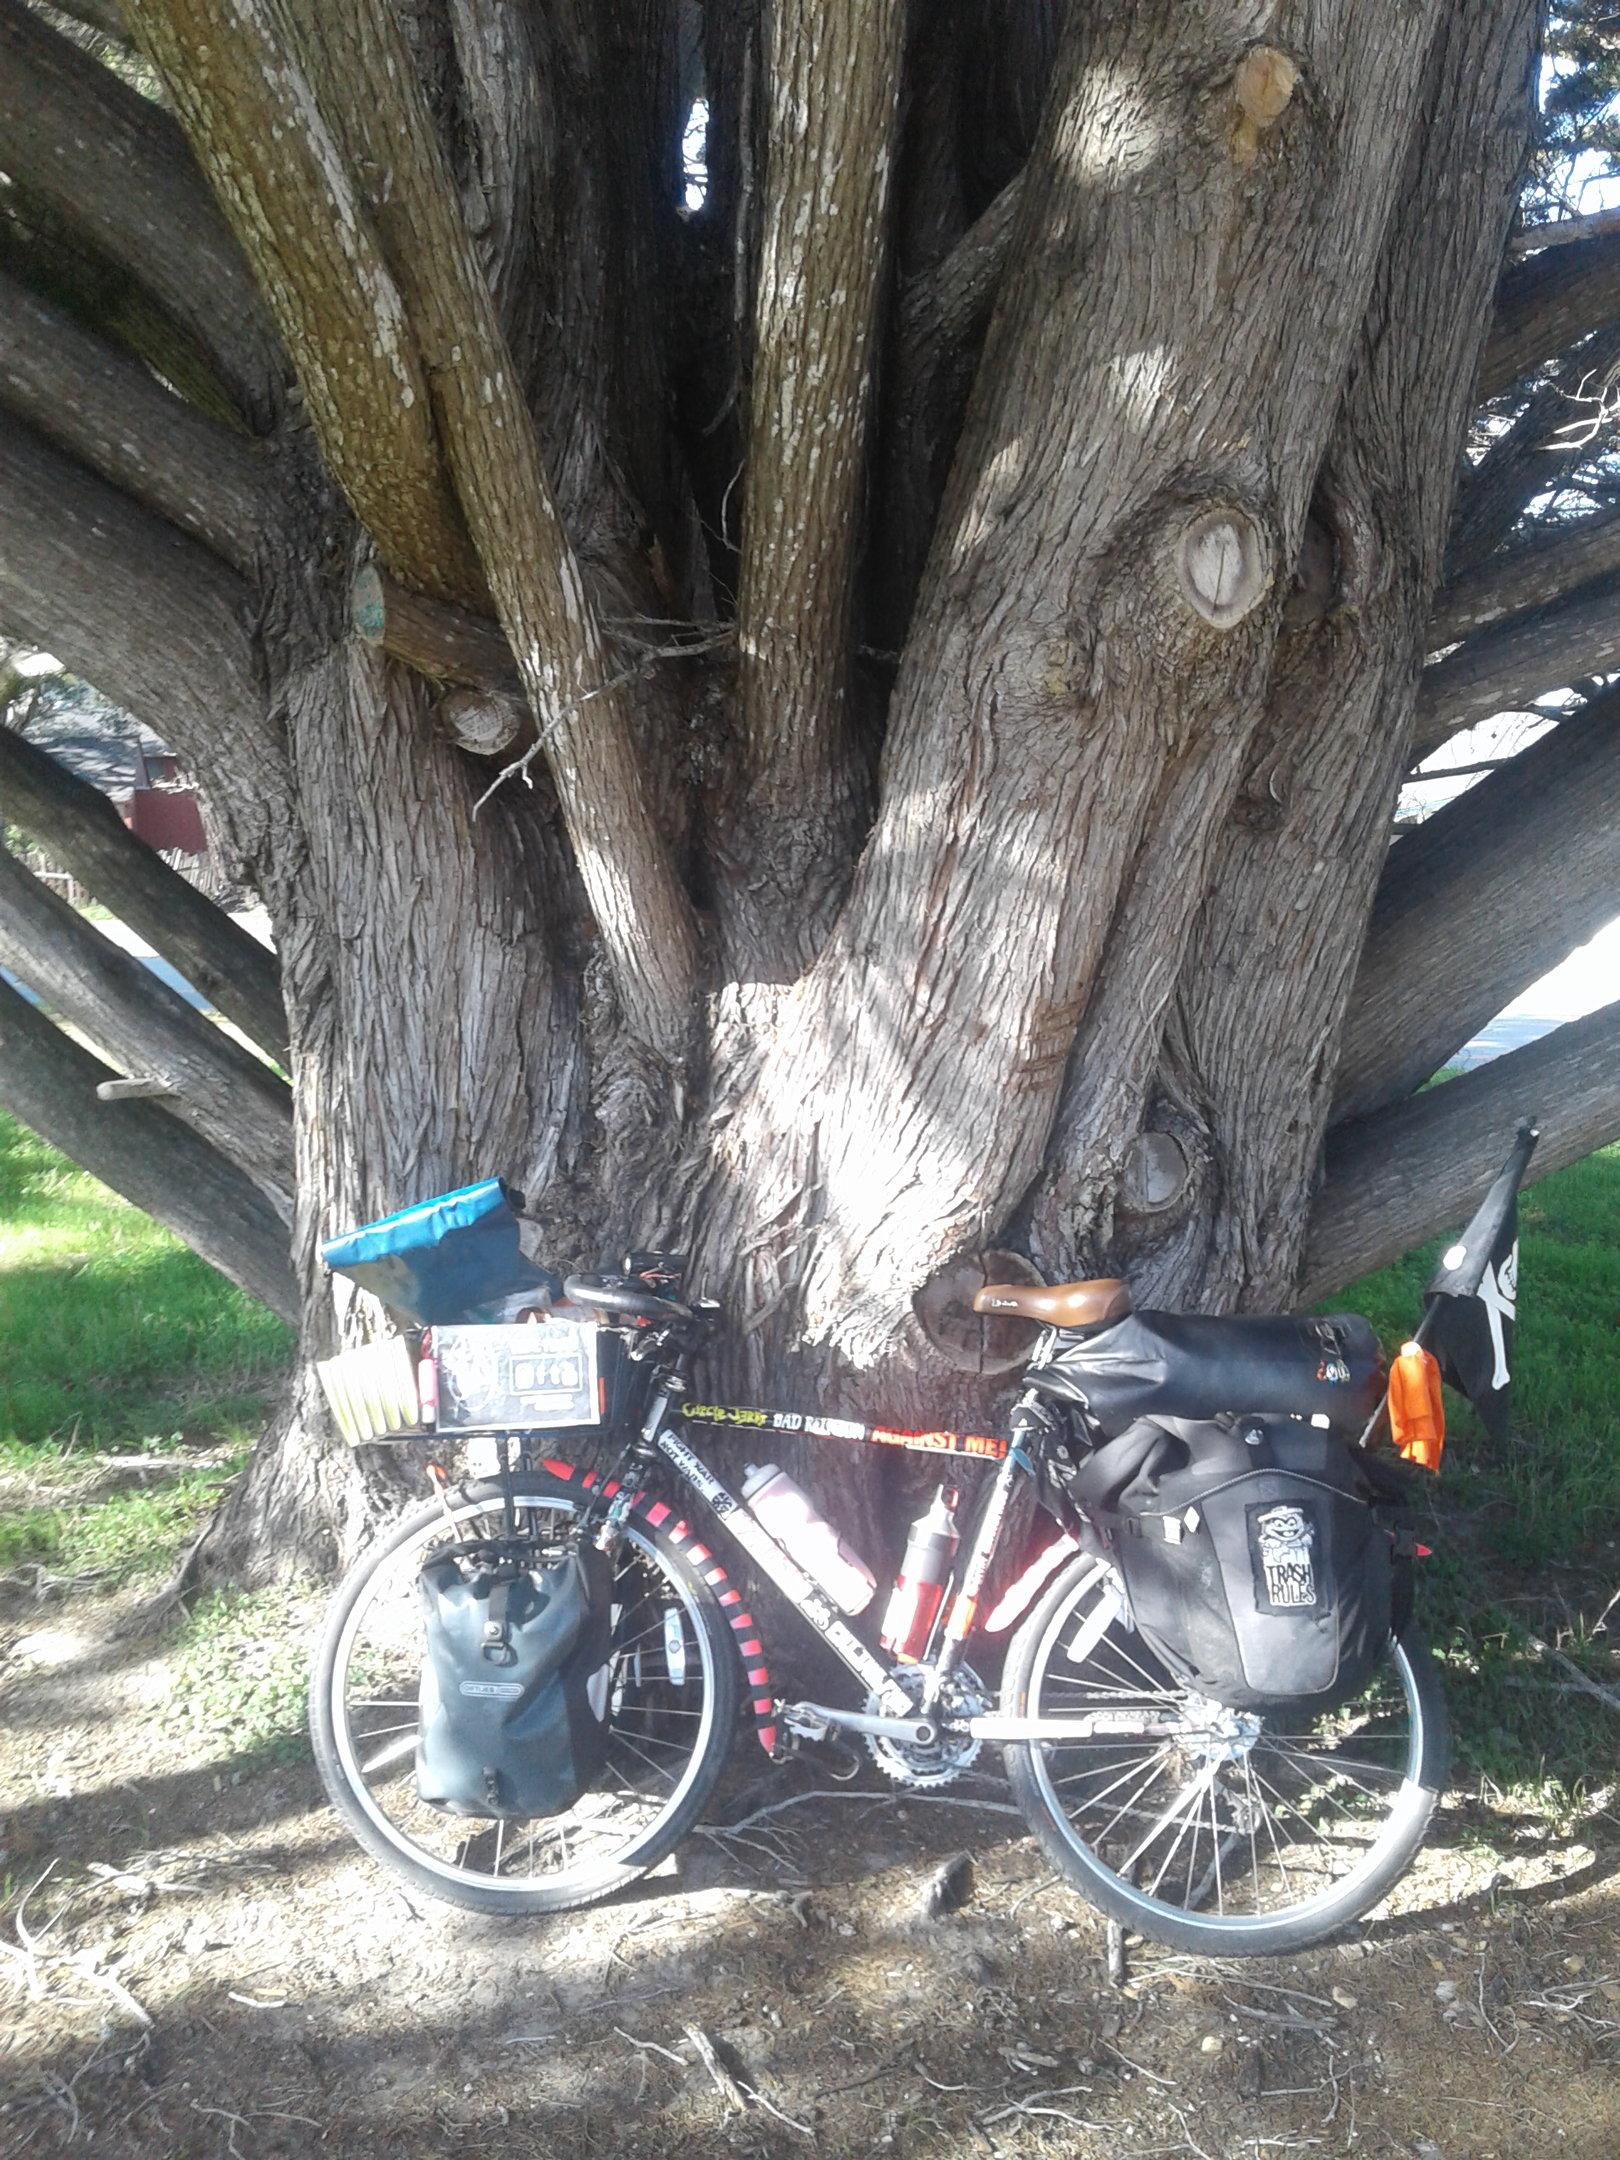 20181230_124908-jpg.48441_FIRST EVER BIKE TOUR (PICS)_Bike Touring_Squat the Planet_2:26 PM